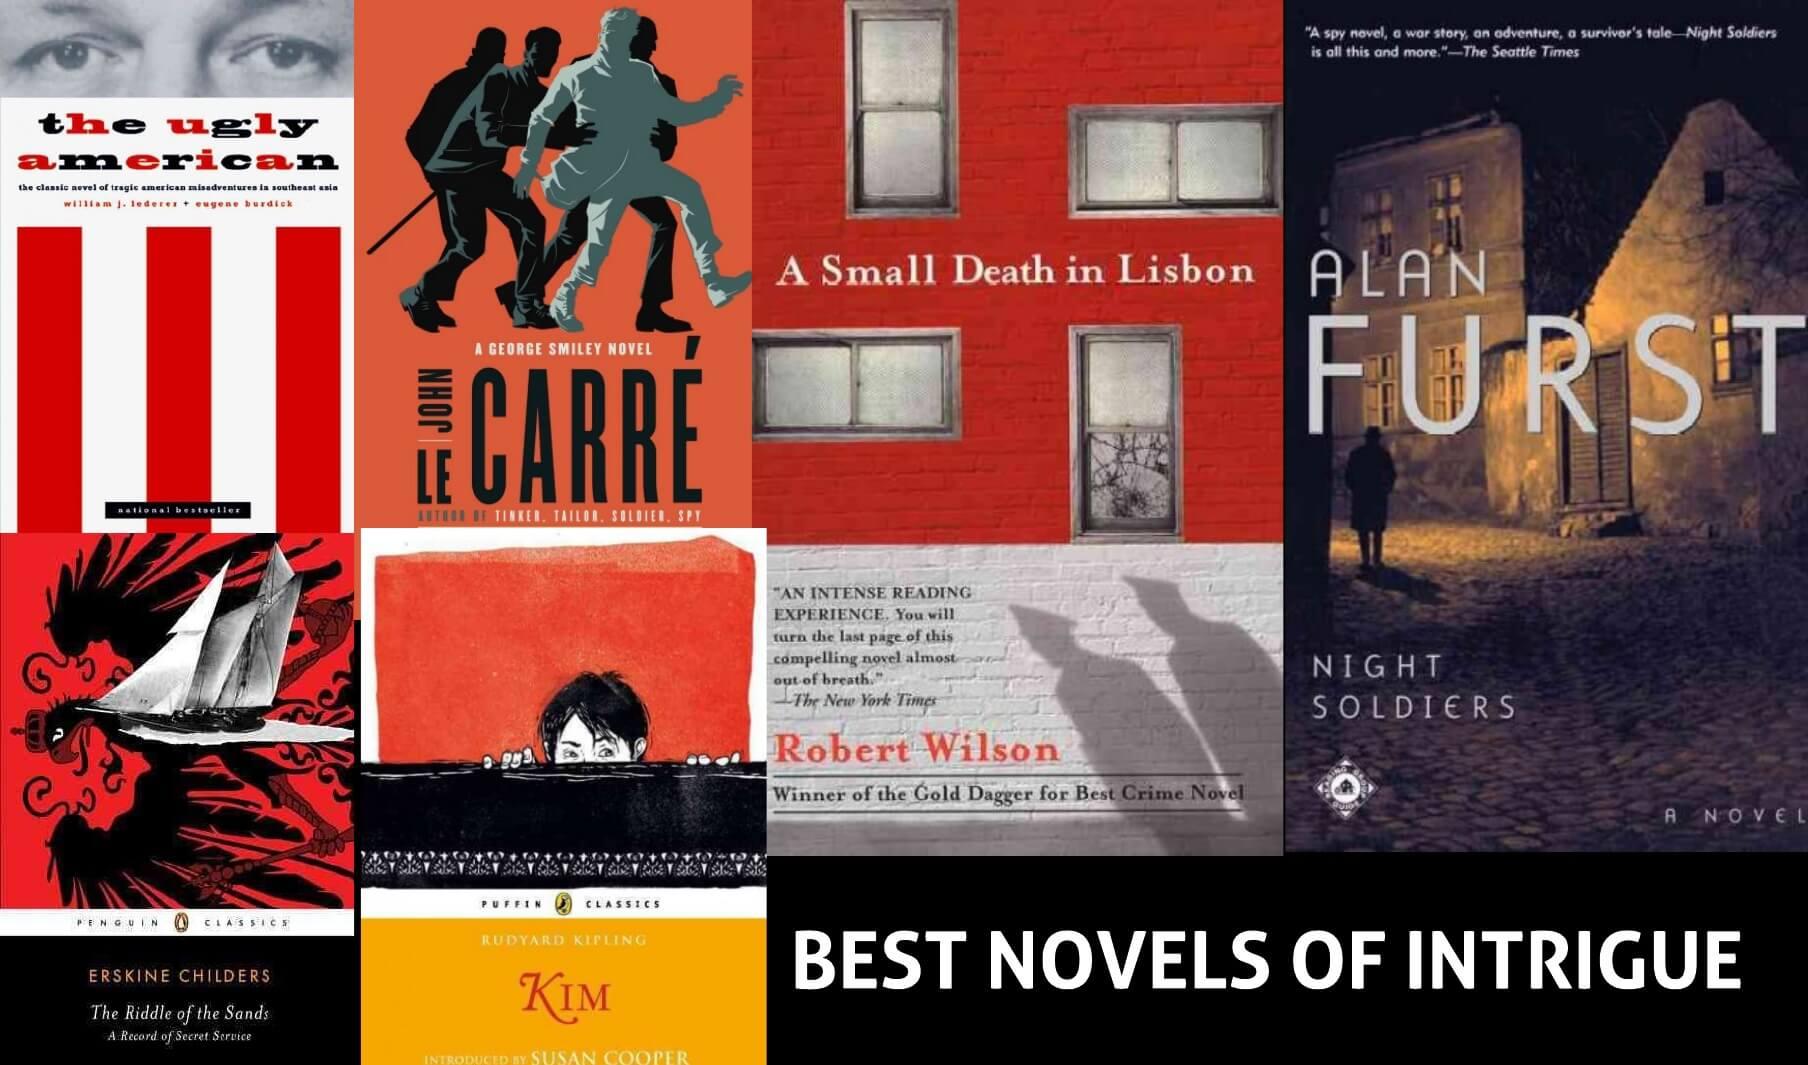 Best Novels of Intrigue